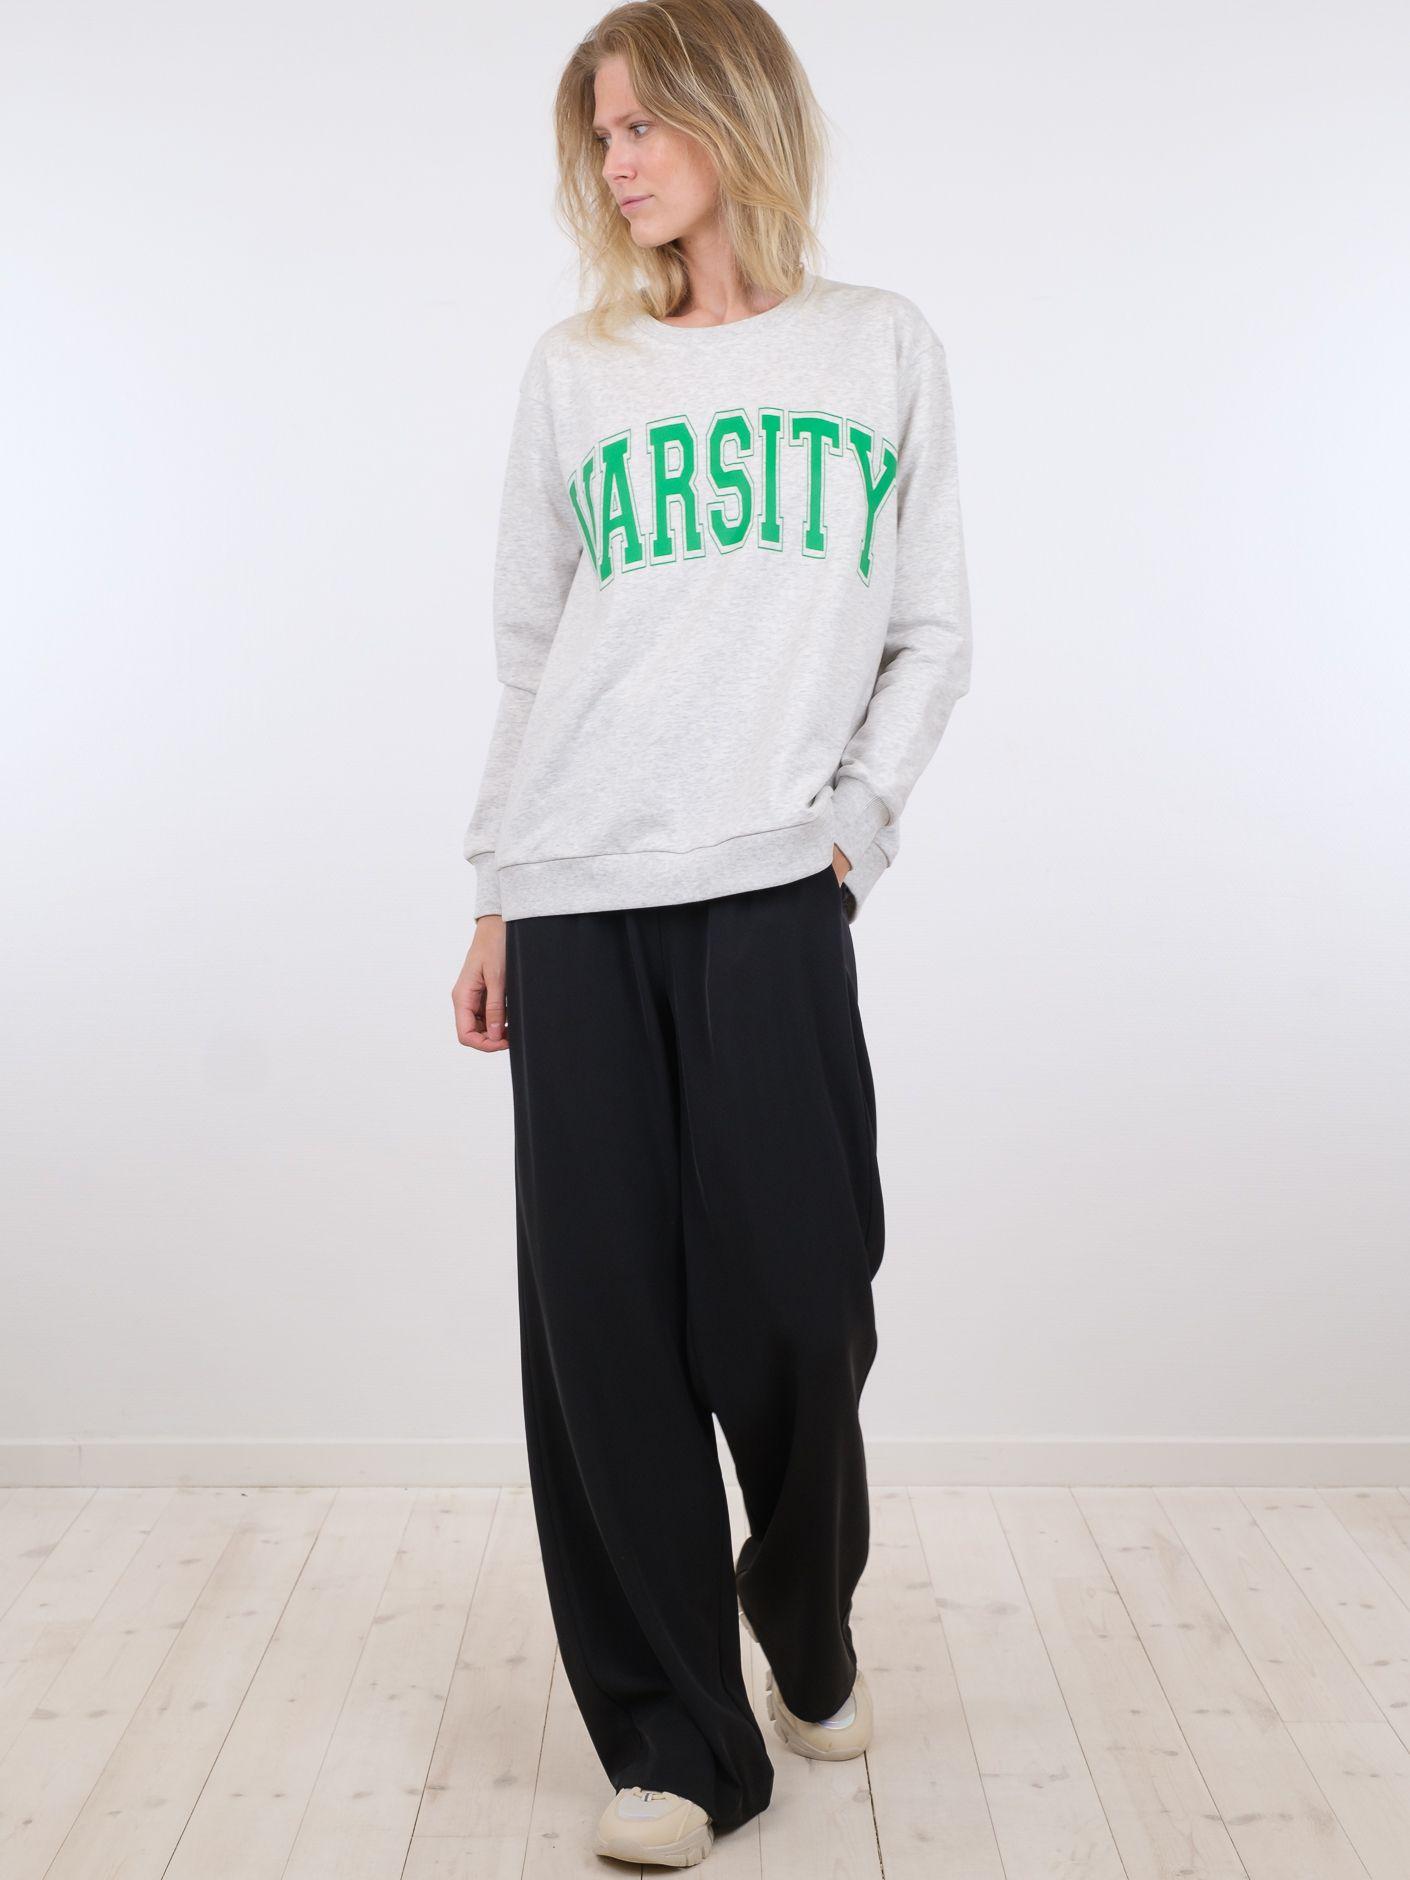 Neo Noir Flex Varsity sweatshirt, light grey melange, 40